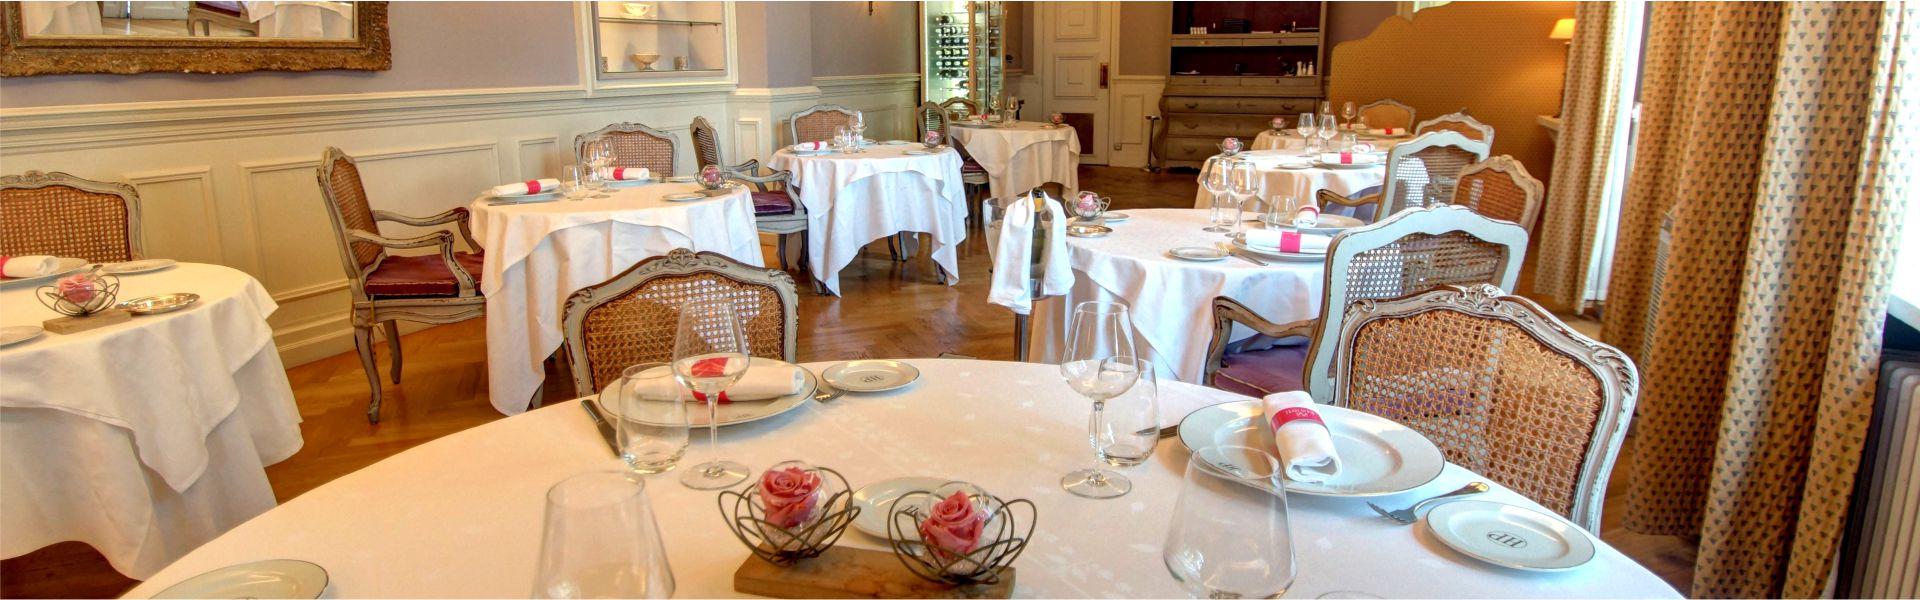 Salle du restaurant Najeti le Relais.